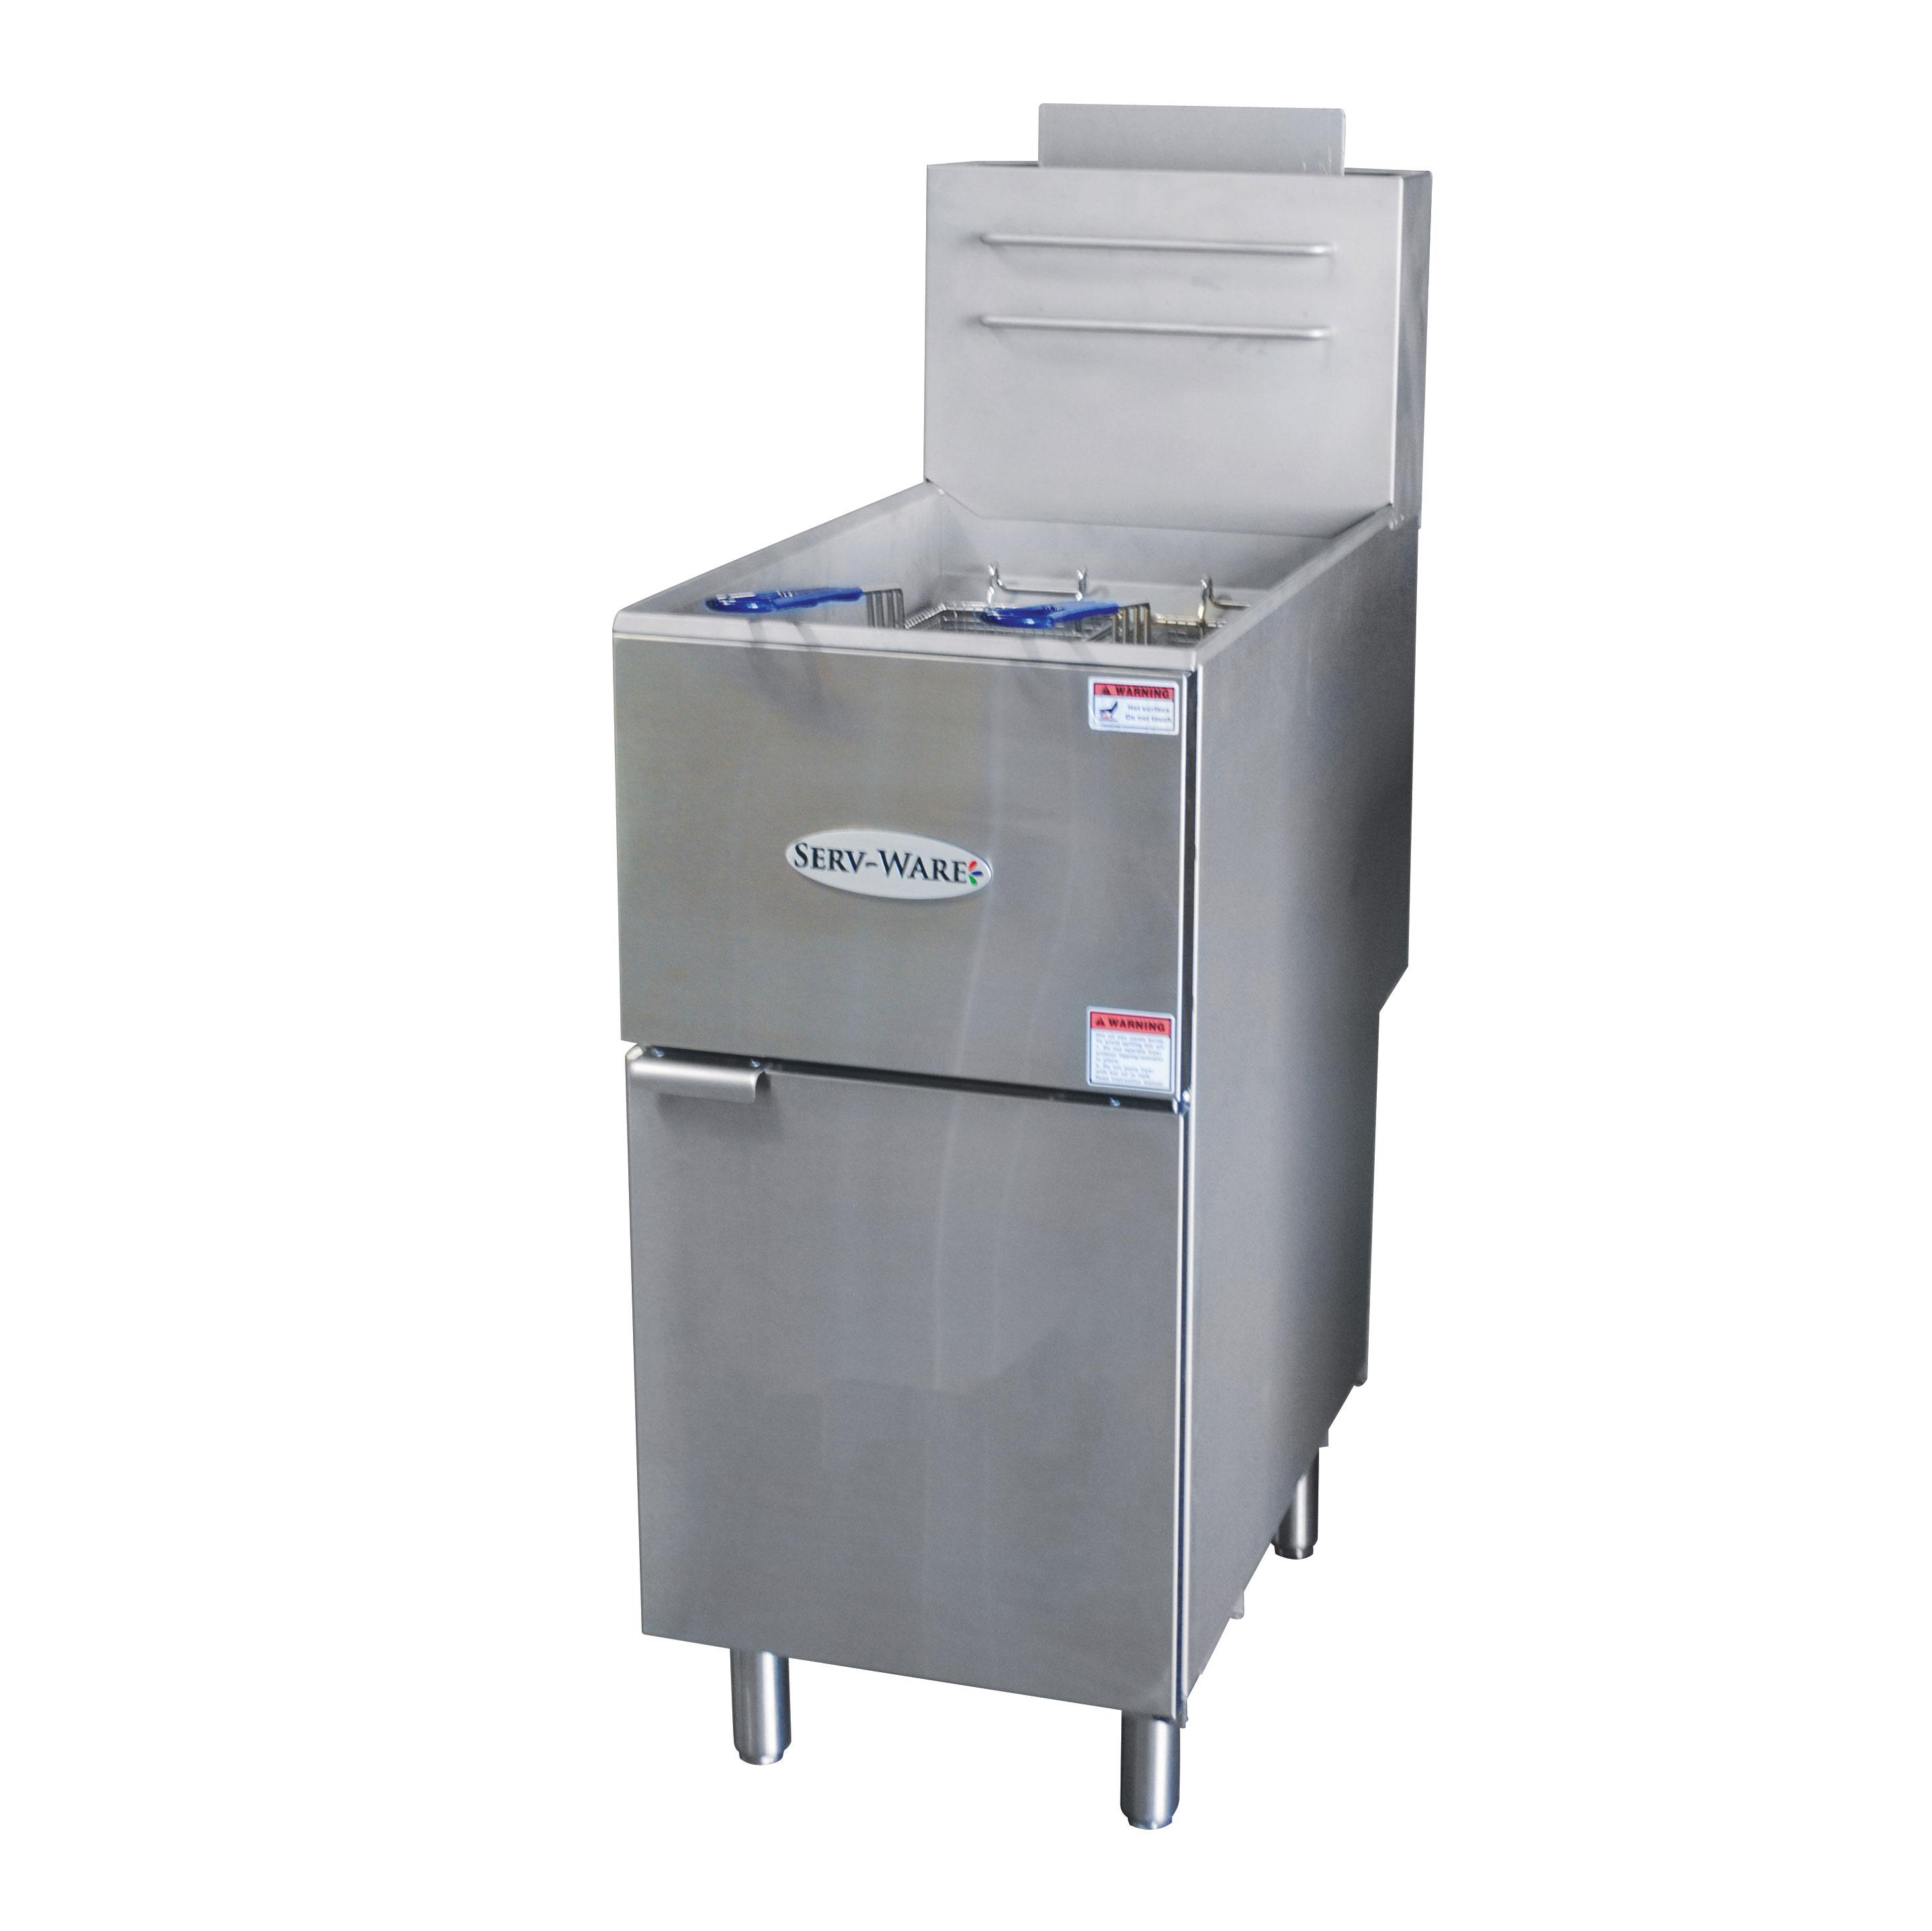 Serv-Ware SGF-40L fryer, gas, floor model, full pot